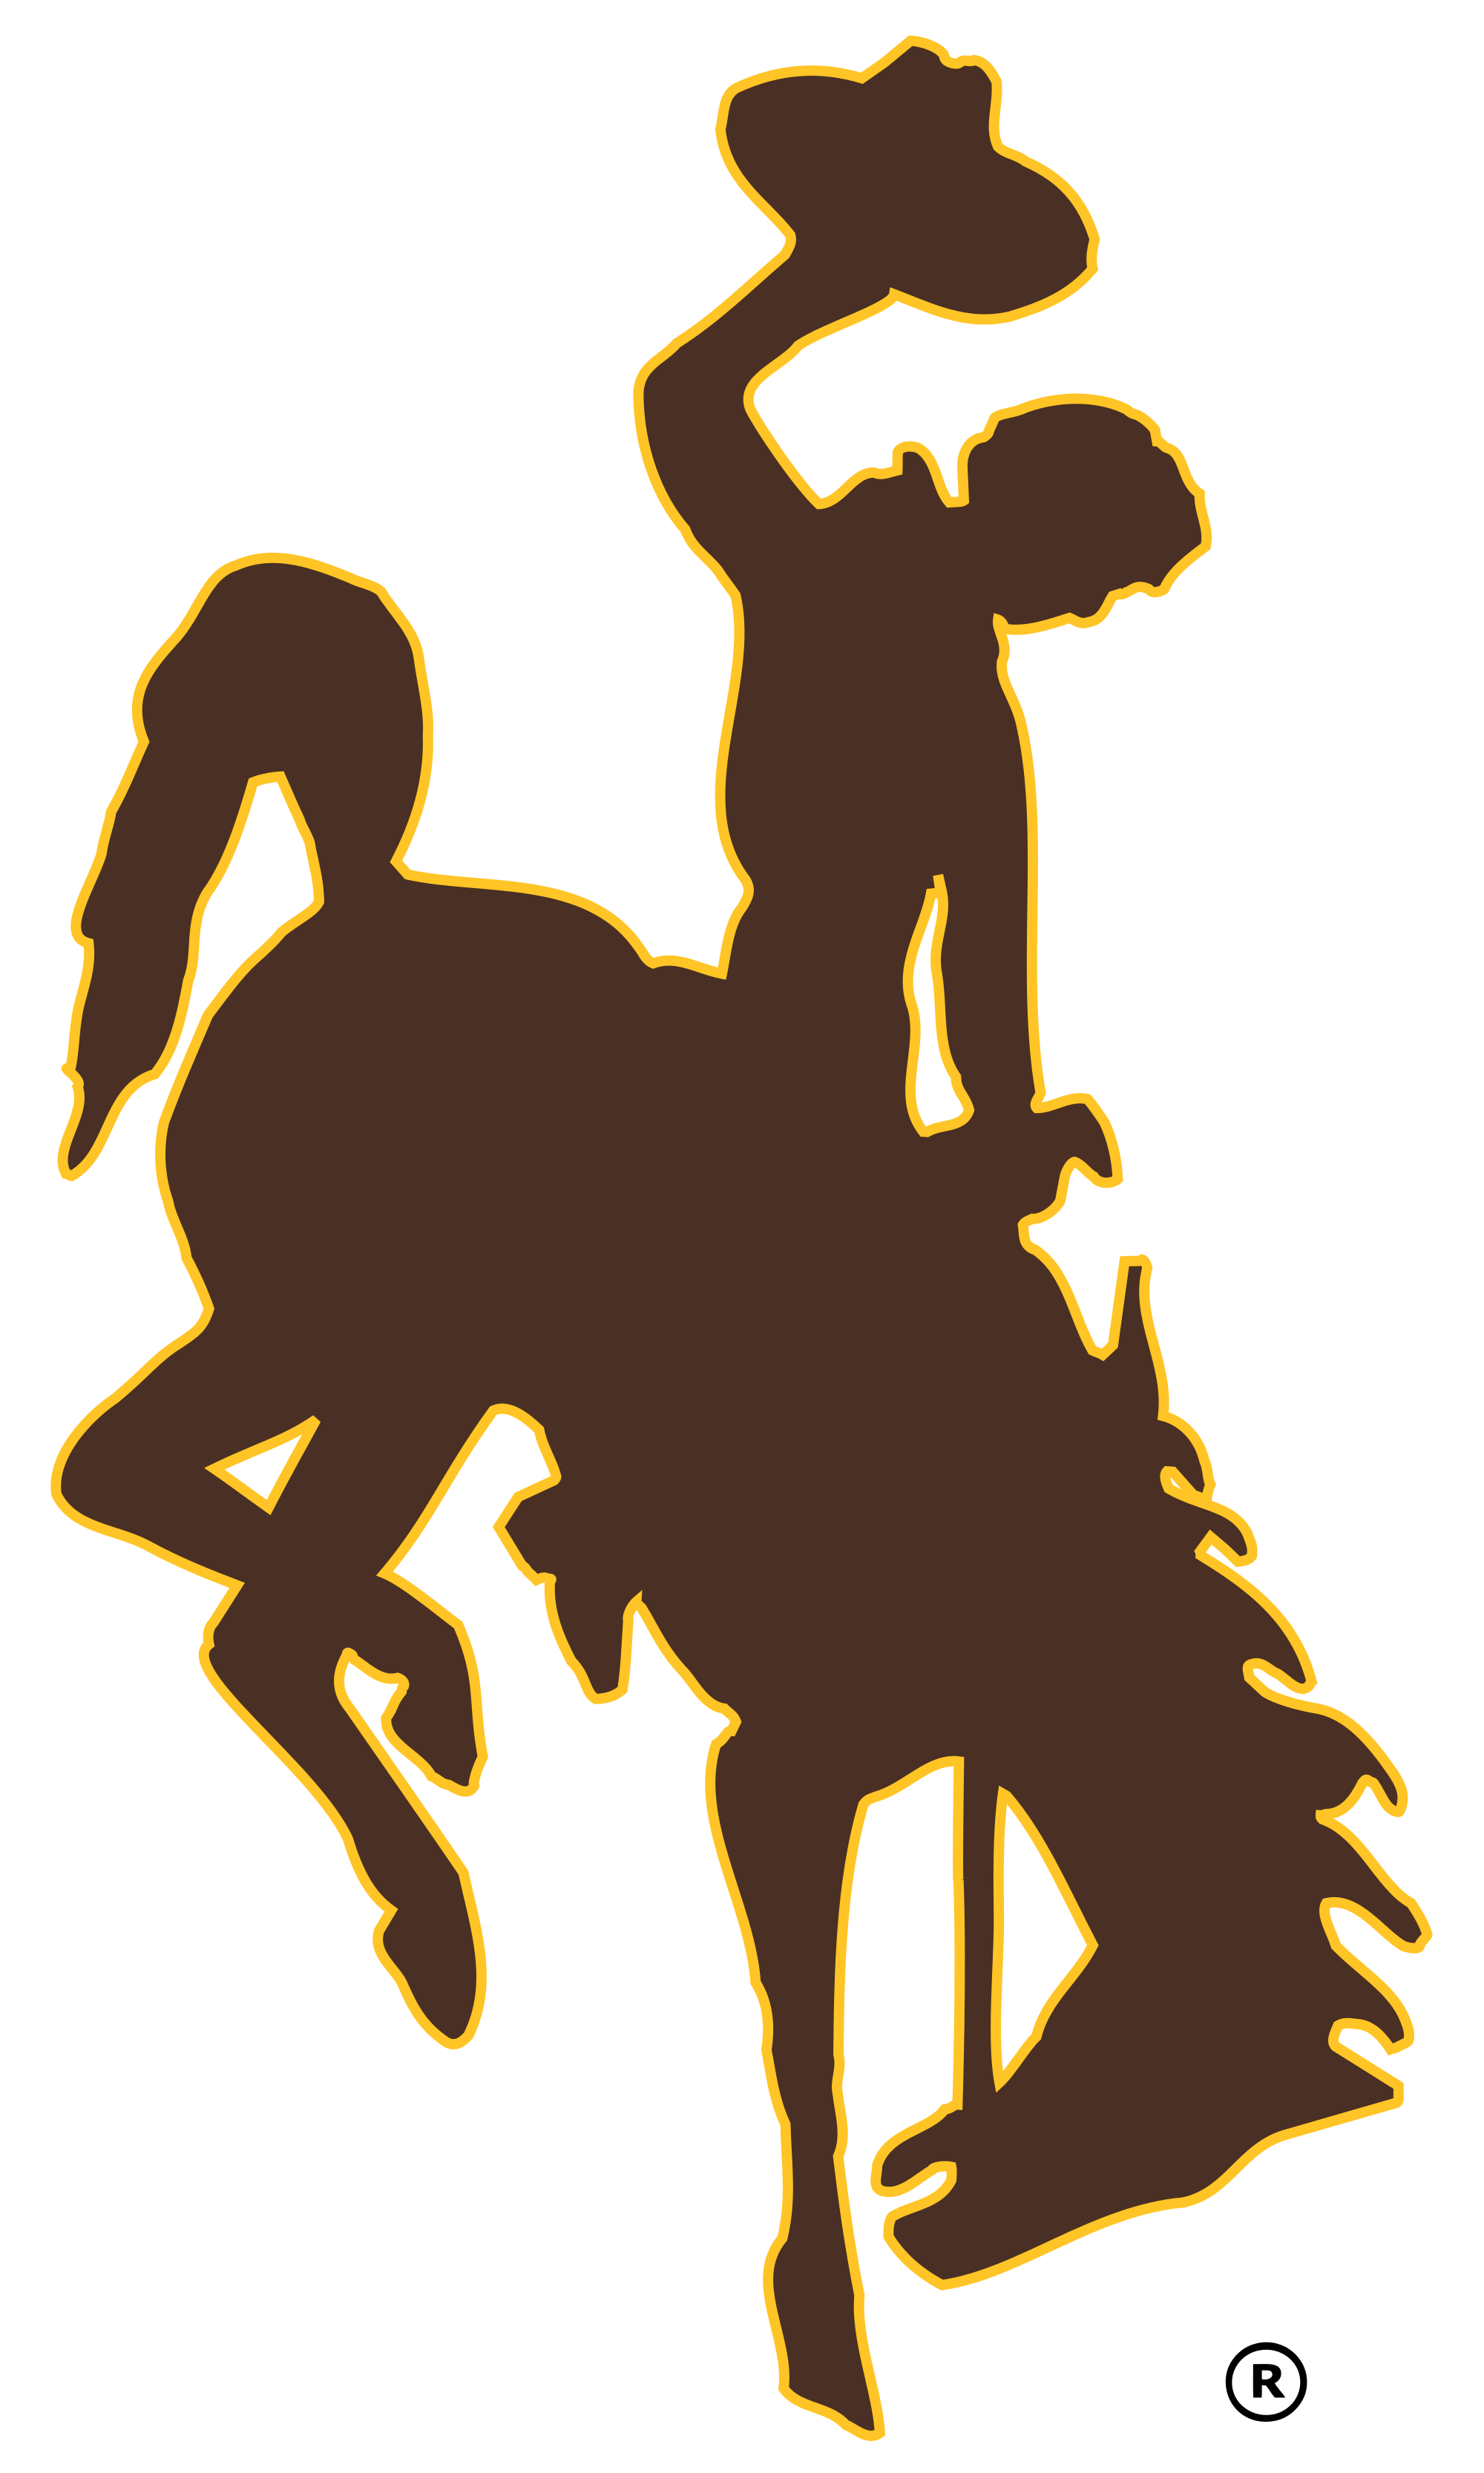 Wyoming football wikipedia the. Dallas cowboys clipart mascot